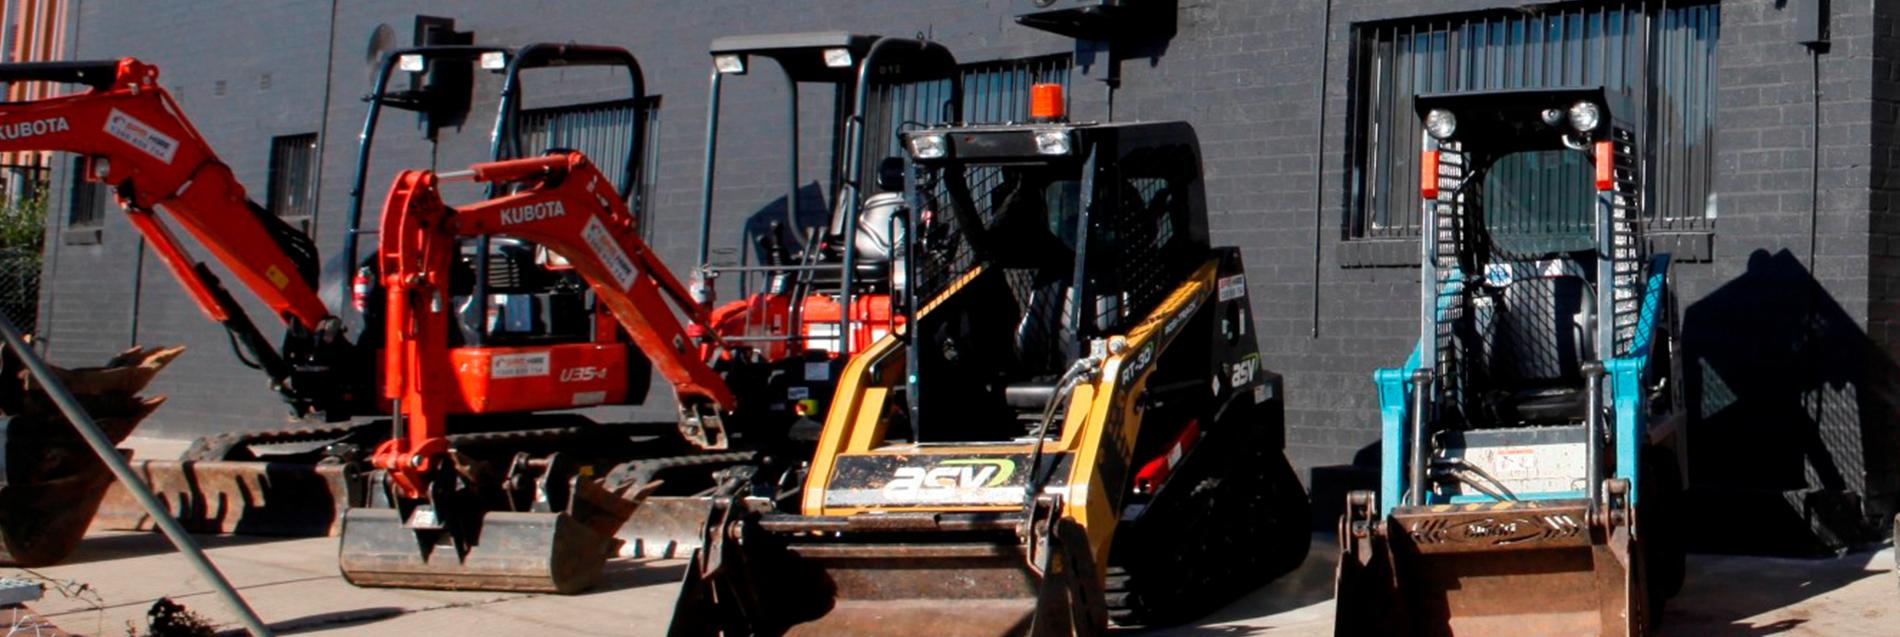 Excavator Hire, Excavator Hire Sydney, Excavator Hire Narellan, Excavator Hire Macarthur, Excavator Hire Auburn, Excavator Hire Wollondilly, Excavator Hire Oran Park, Excavator Hire, Excavator Hire Sydney, Excavator Hire Narellan, Excavator Hire Macarthur, Excavator Hire Auburn, Excavator Hire Wollondilly, Excavator Hire Oran Park, Excavator Hire Gregory Hills